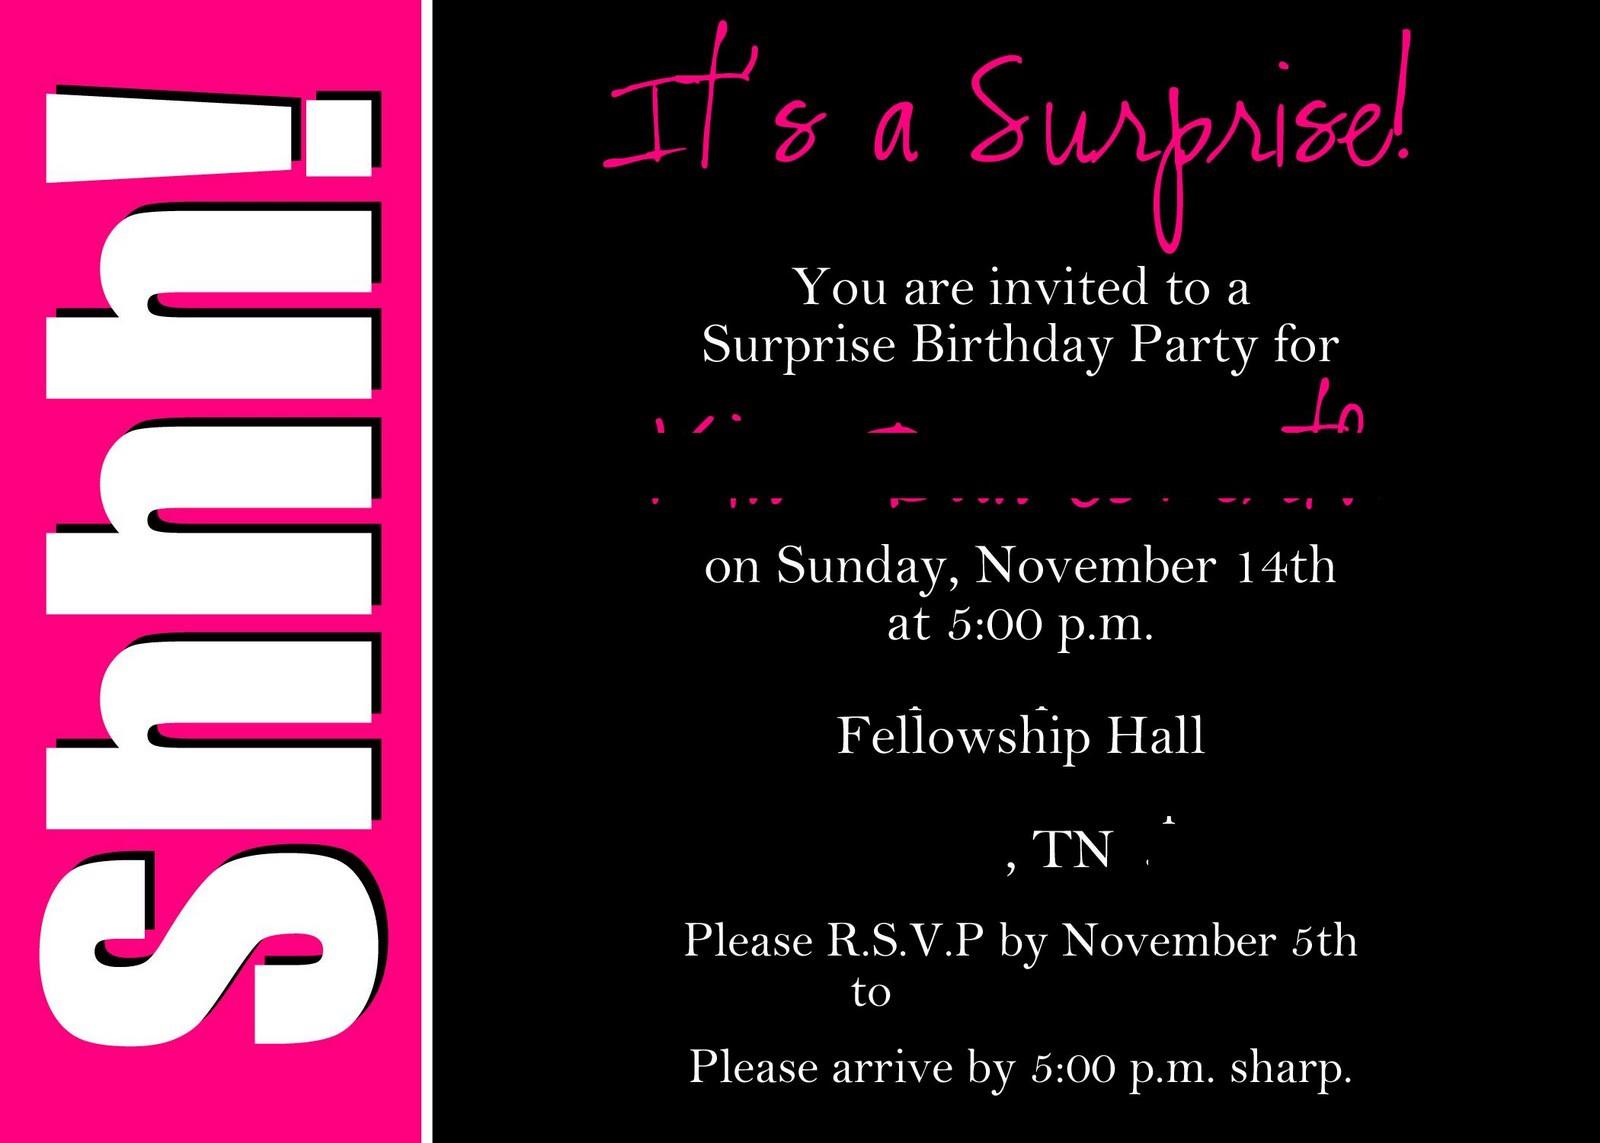 Bddcfcffaddd Fancy Free Printable Surprise 60Th Birthday Invitations - Free Printable Surprise 60Th Birthday Invitations